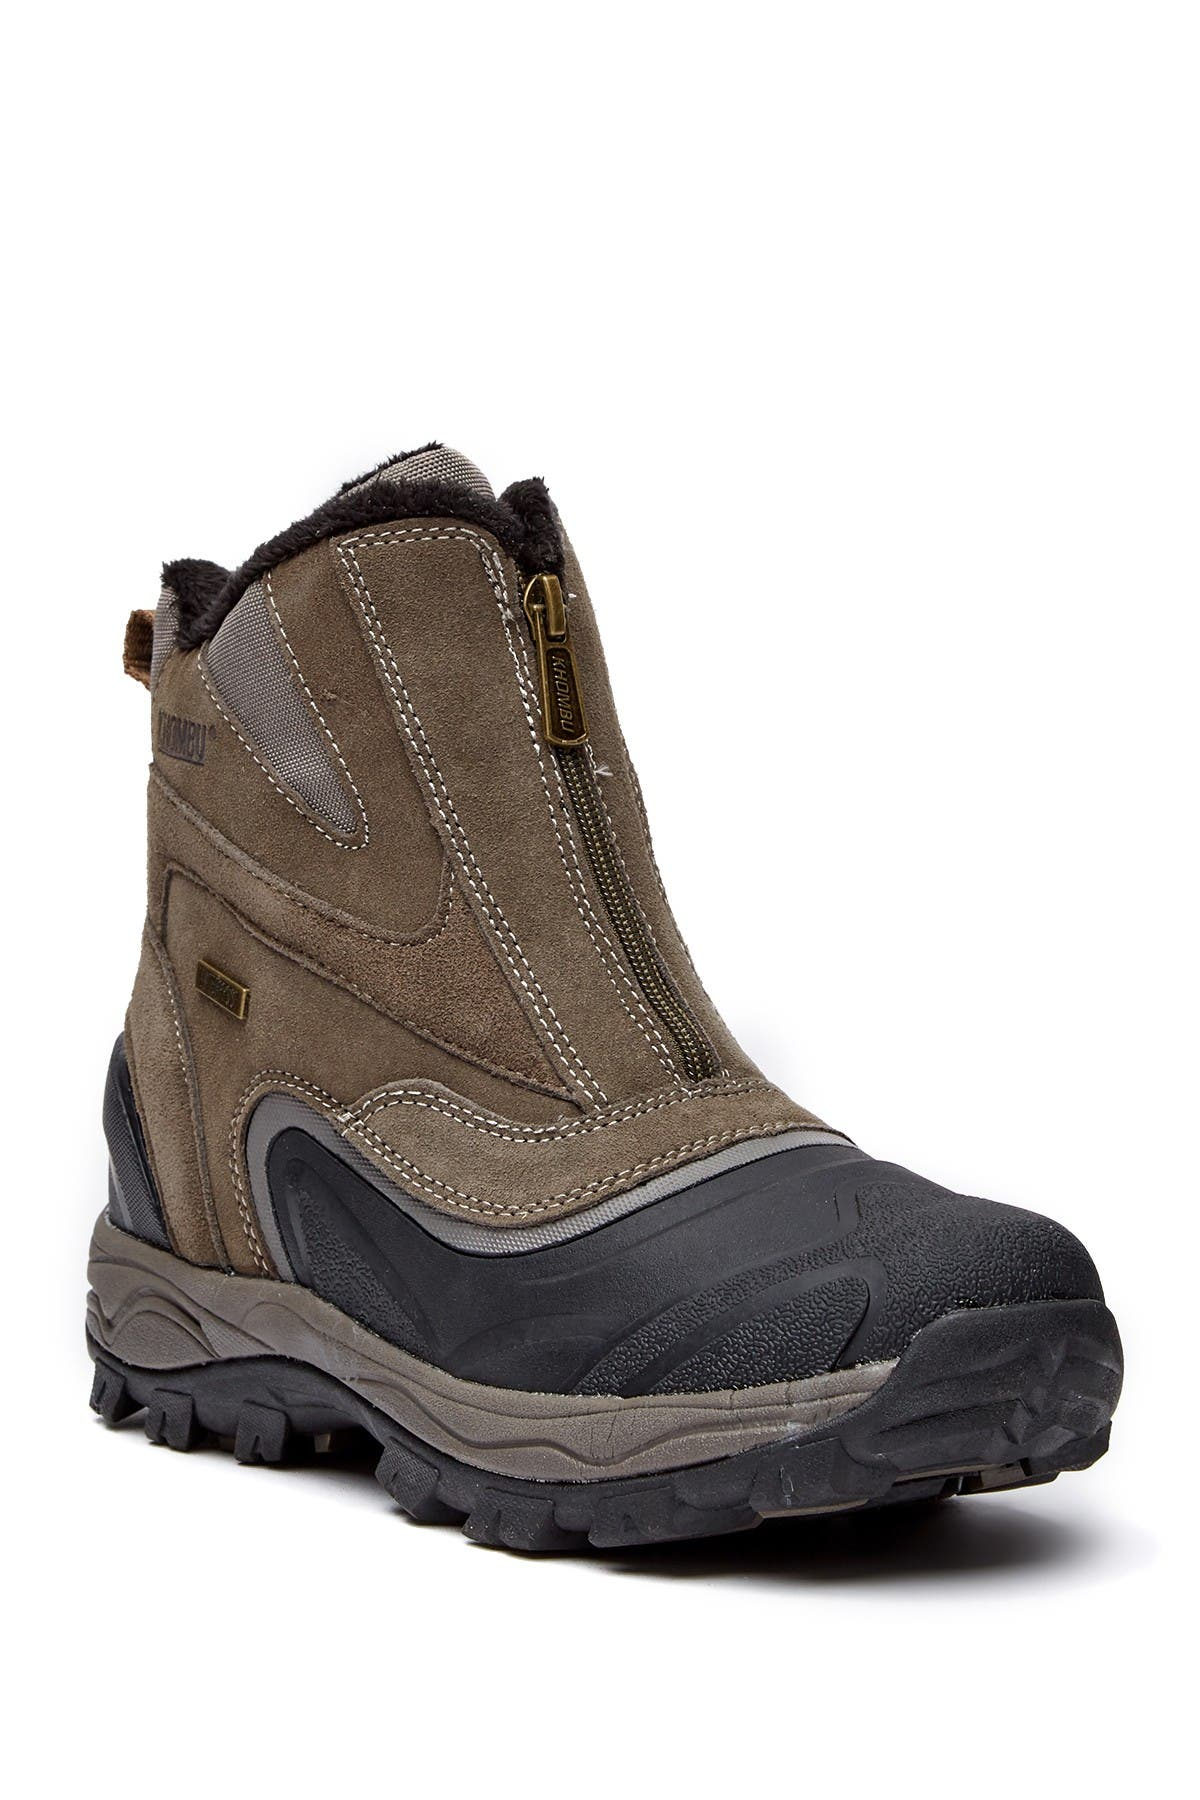 Image of Khombu Rein Waterproof Snow Boot